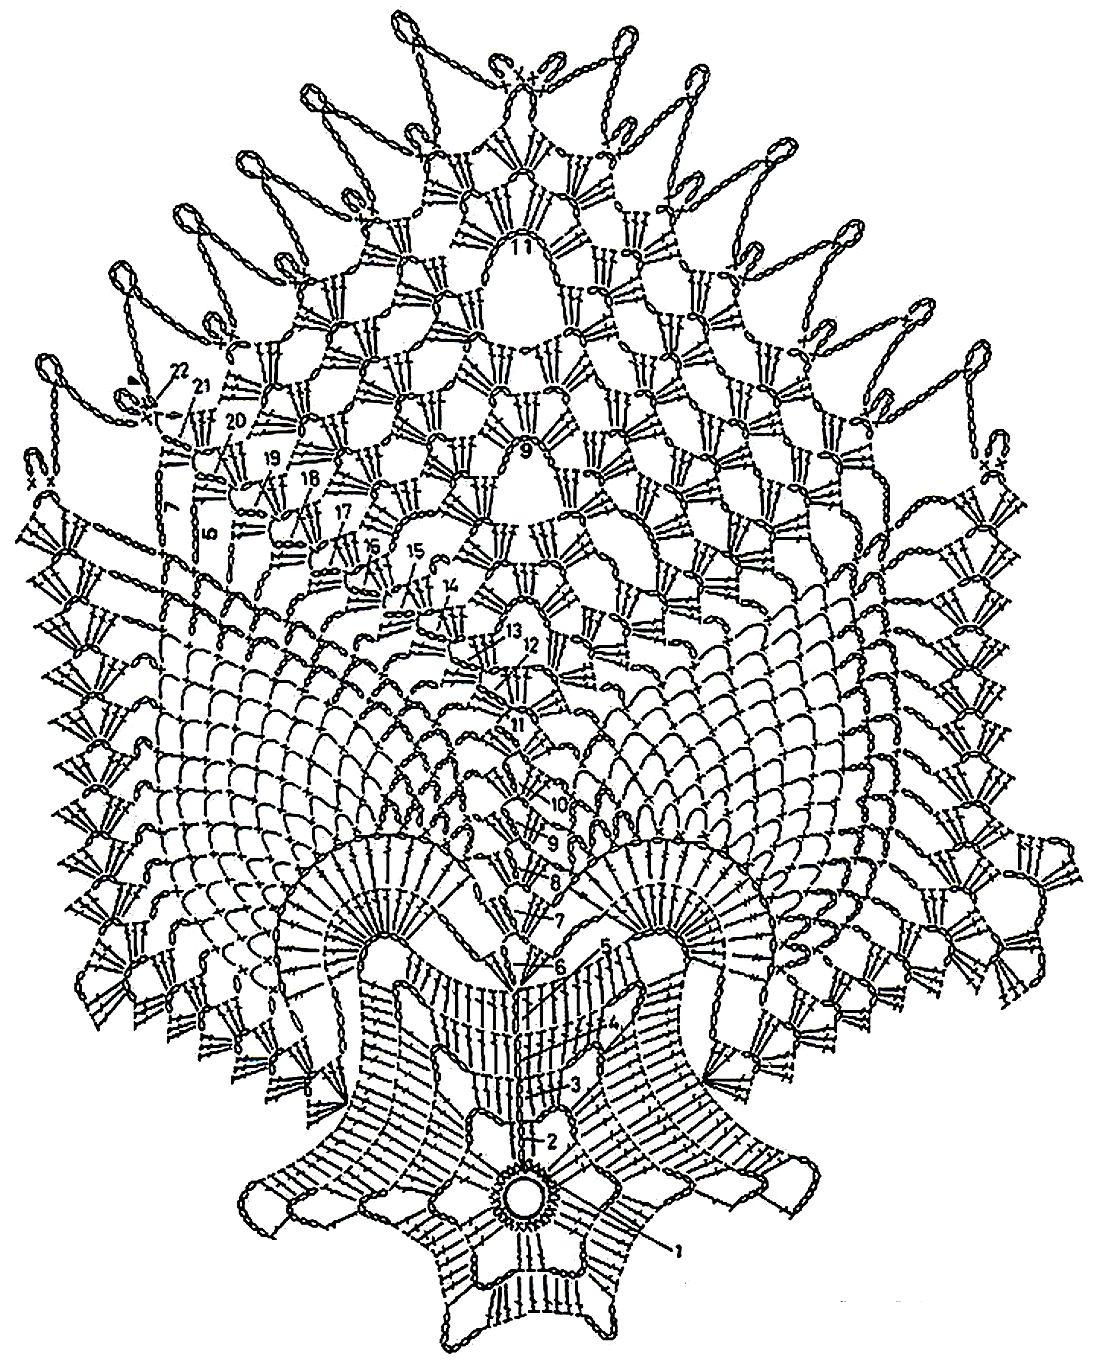 Schema Crochet Centro Tavola